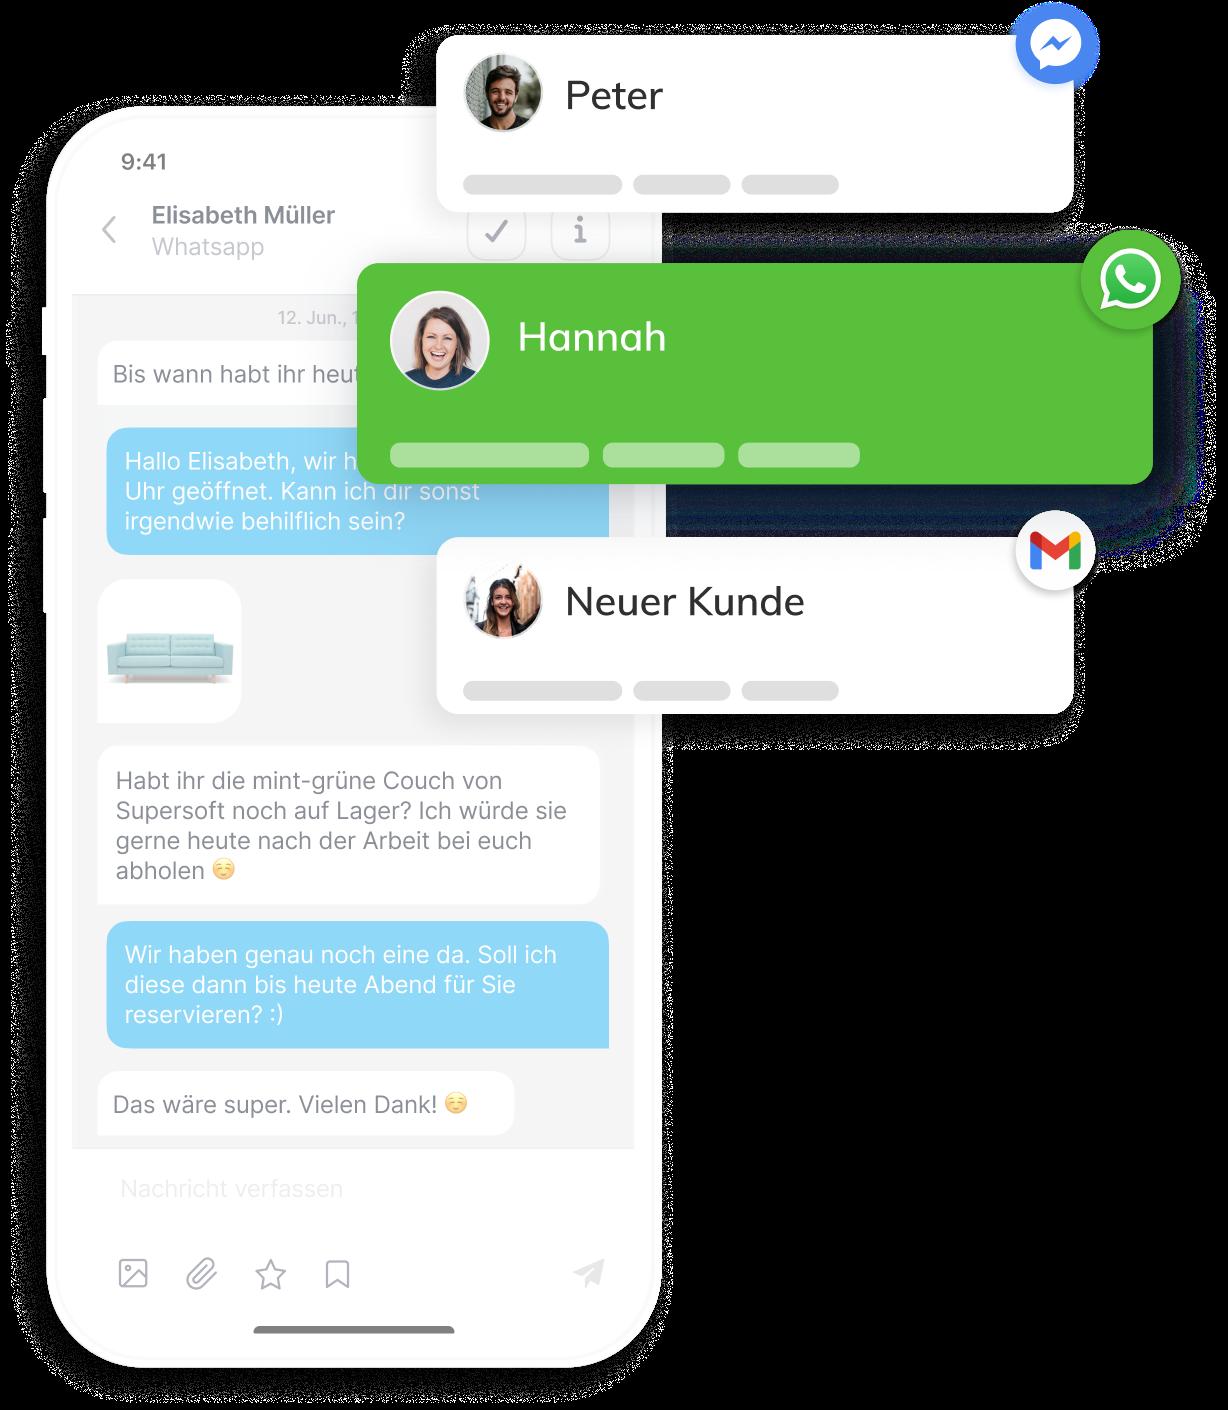 communication-unified-inbox